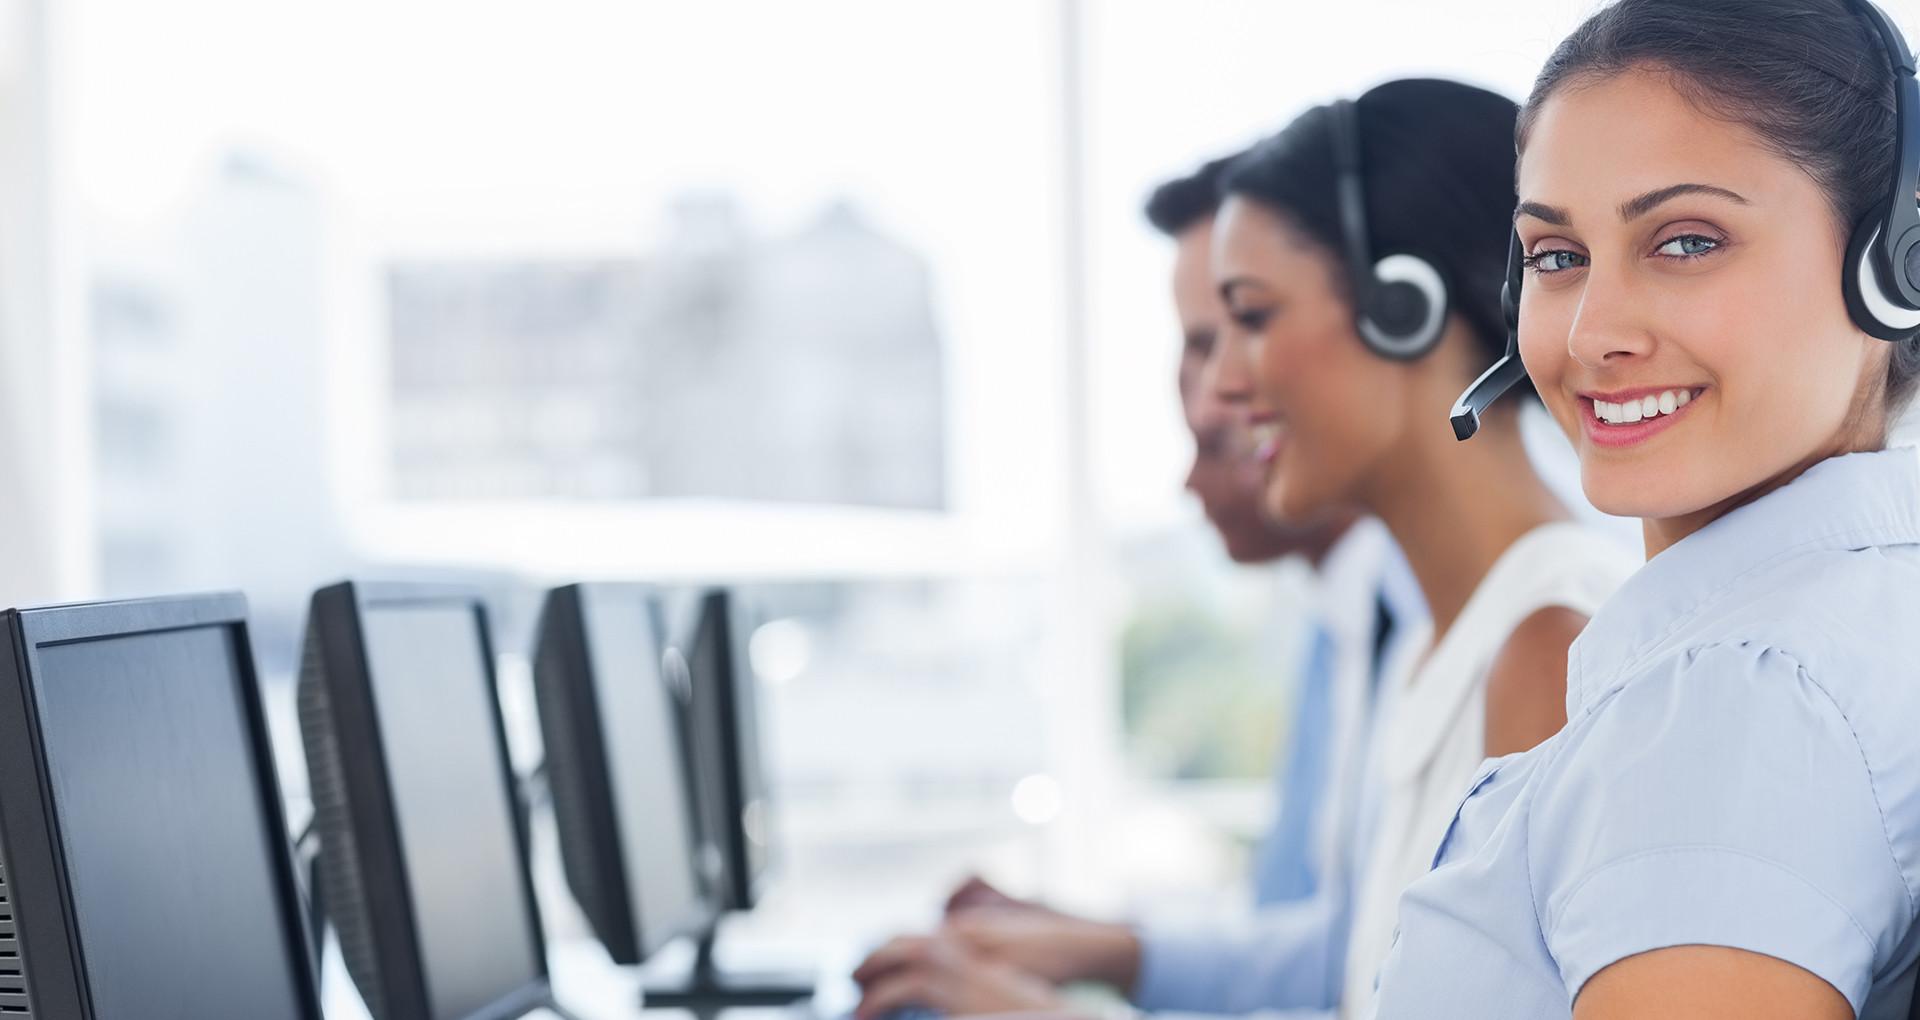 easytrack call center - Unbegrenzter Service jenseits der Fahrzeugortung